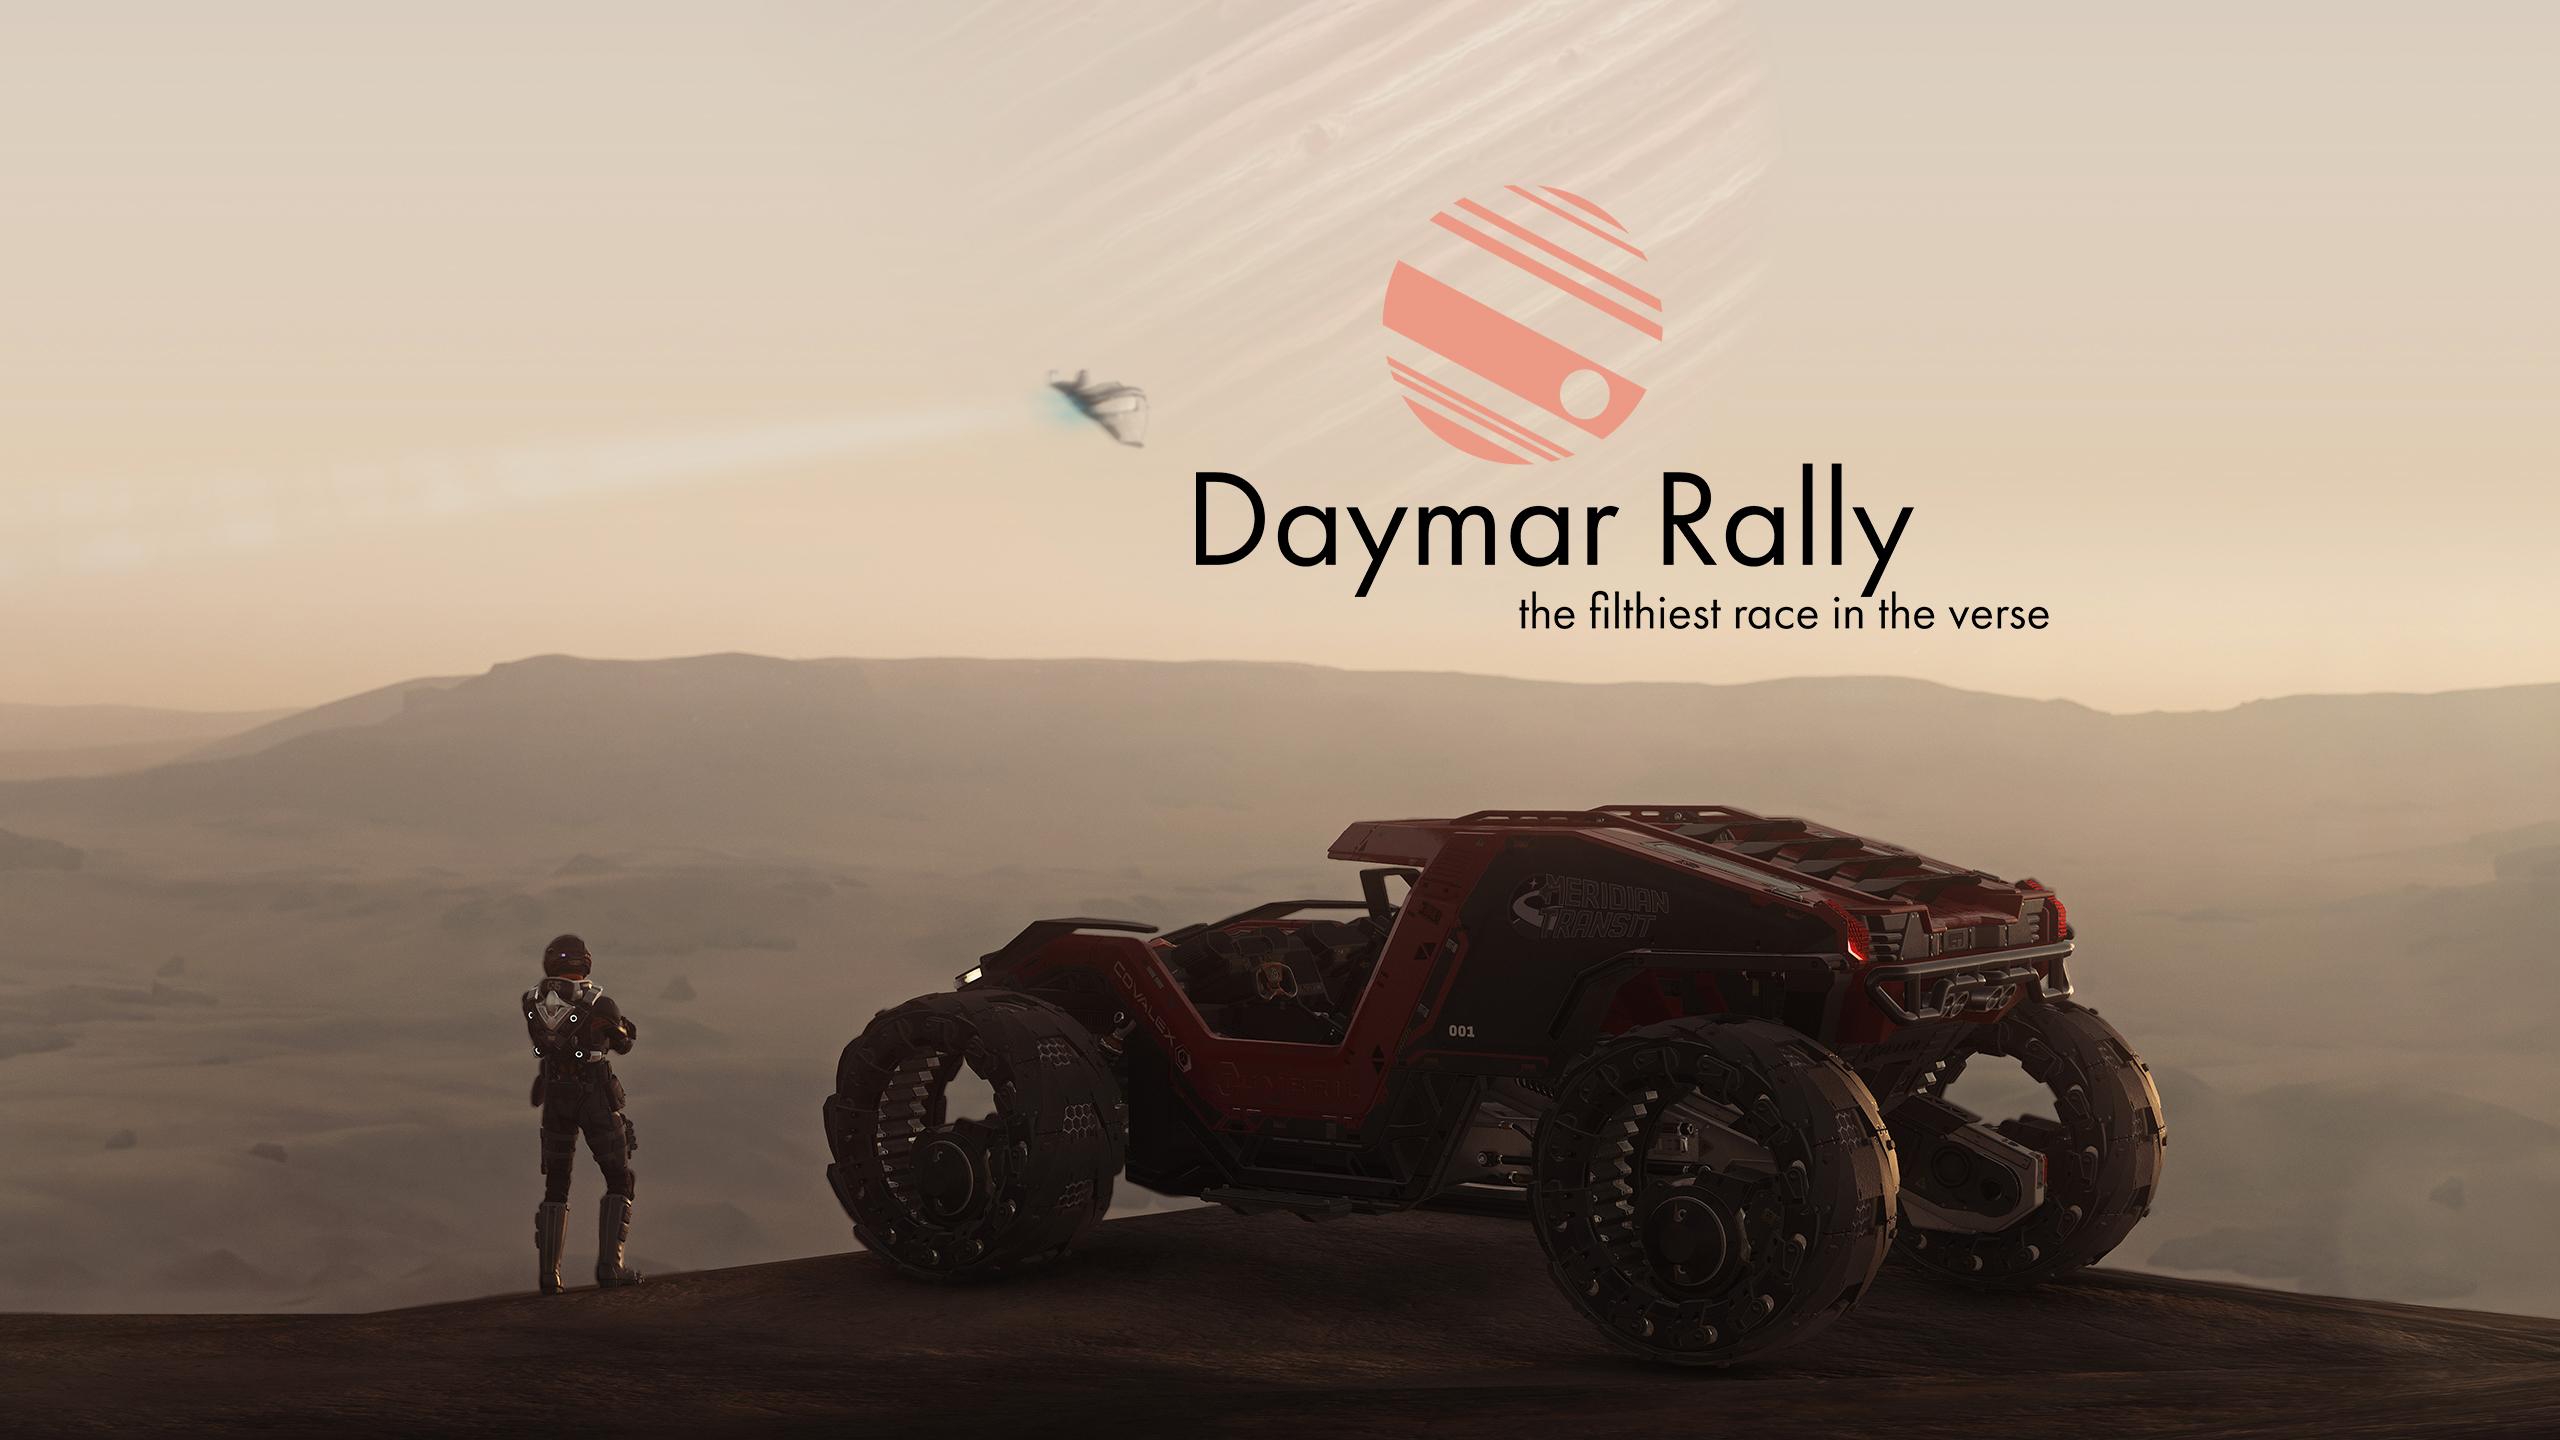 Daymar Rally 'Take Your Marks' Teaser